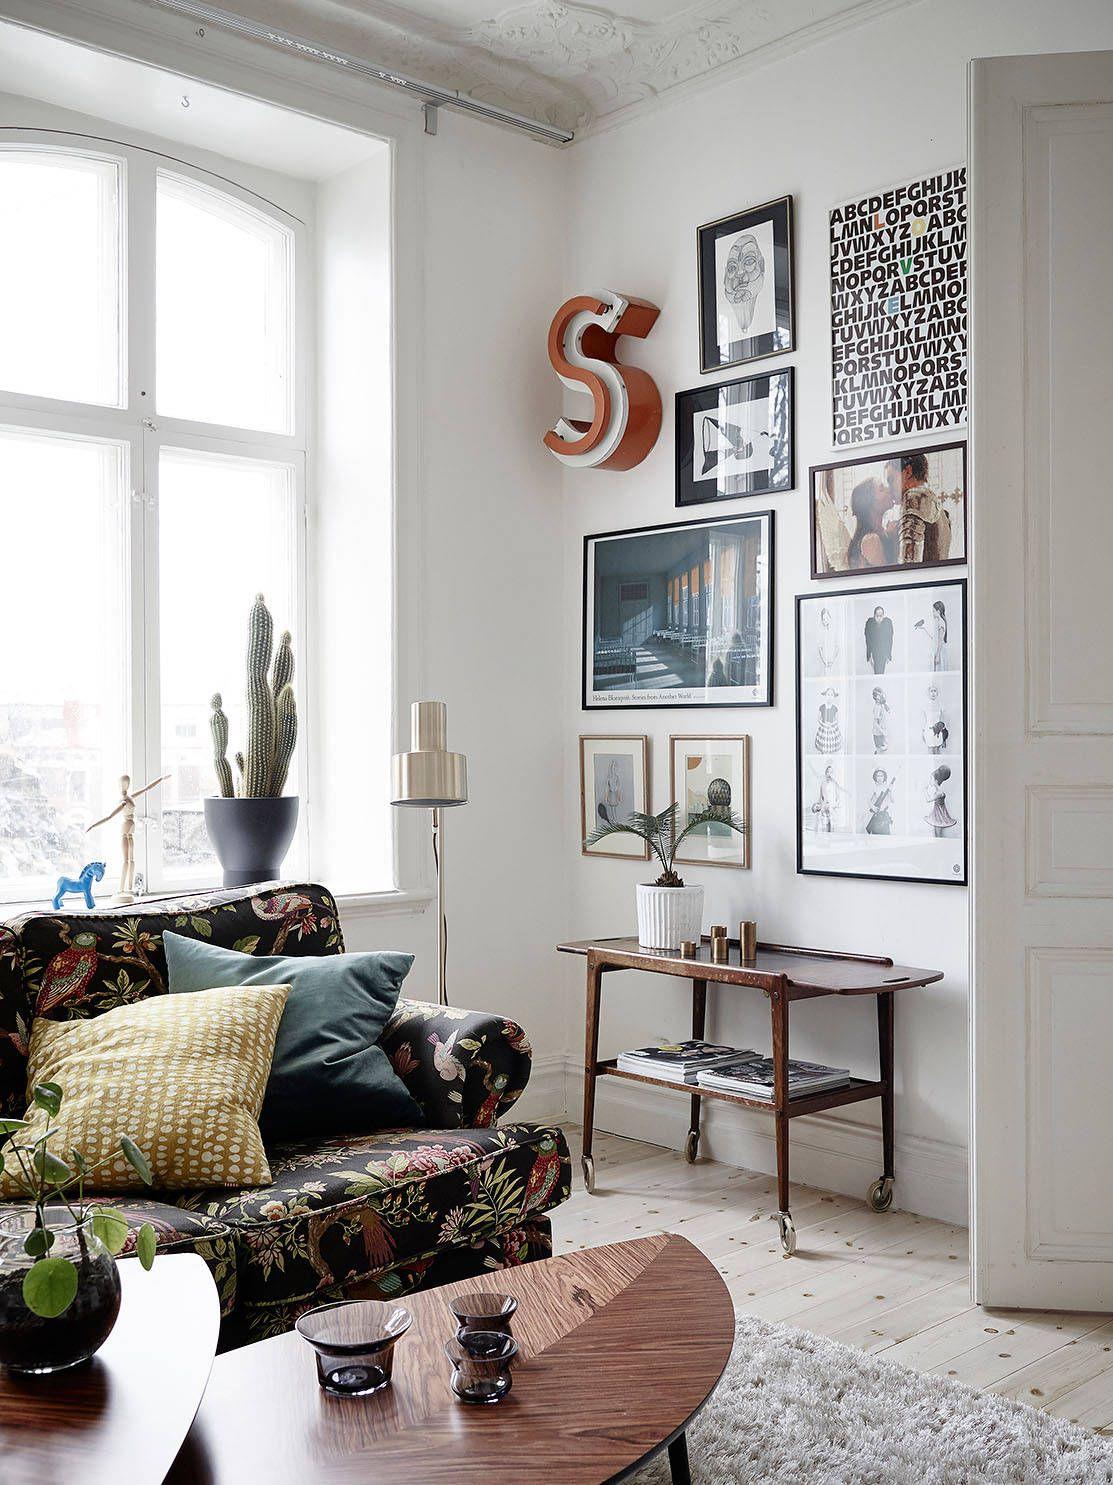 visite d 39 un appartement su dois elephant in the room. Black Bedroom Furniture Sets. Home Design Ideas